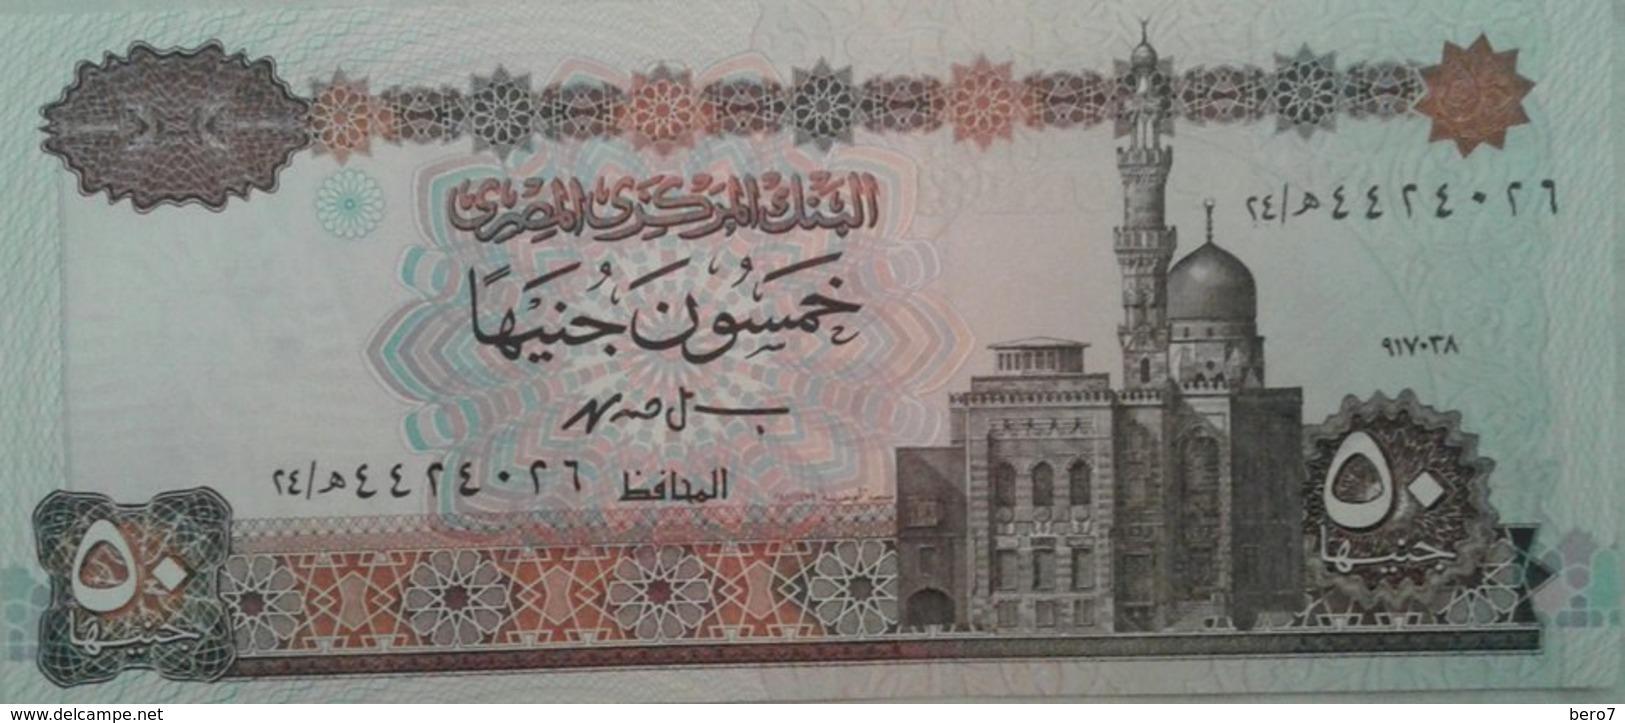 50 Pounds Egypt 1998 UNC Perfix # 24 Ismail Hasan (Egypte) (Egitto) (Ägypten) (Egipto) (Egypten)  Africa - Egypte